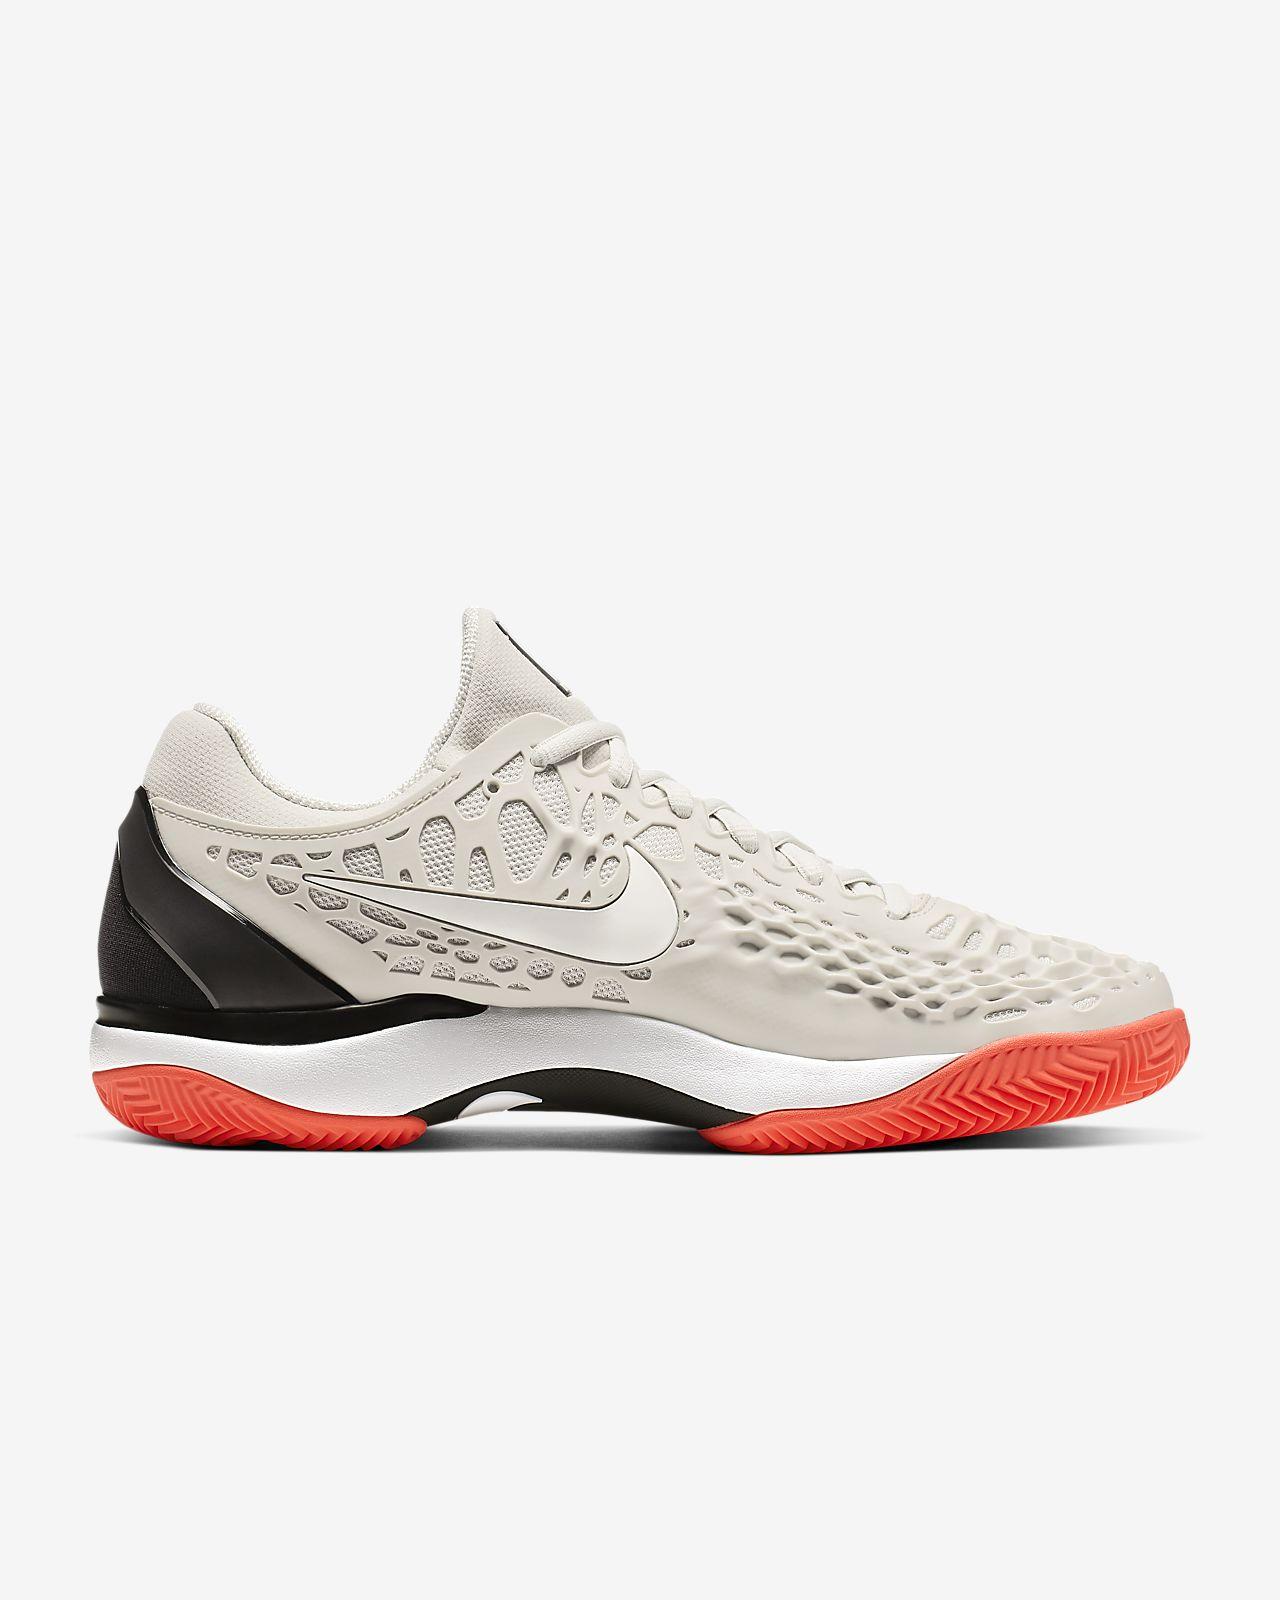 NikeCourt Zoom Cage 3 Men's Clay Tennis Shoe